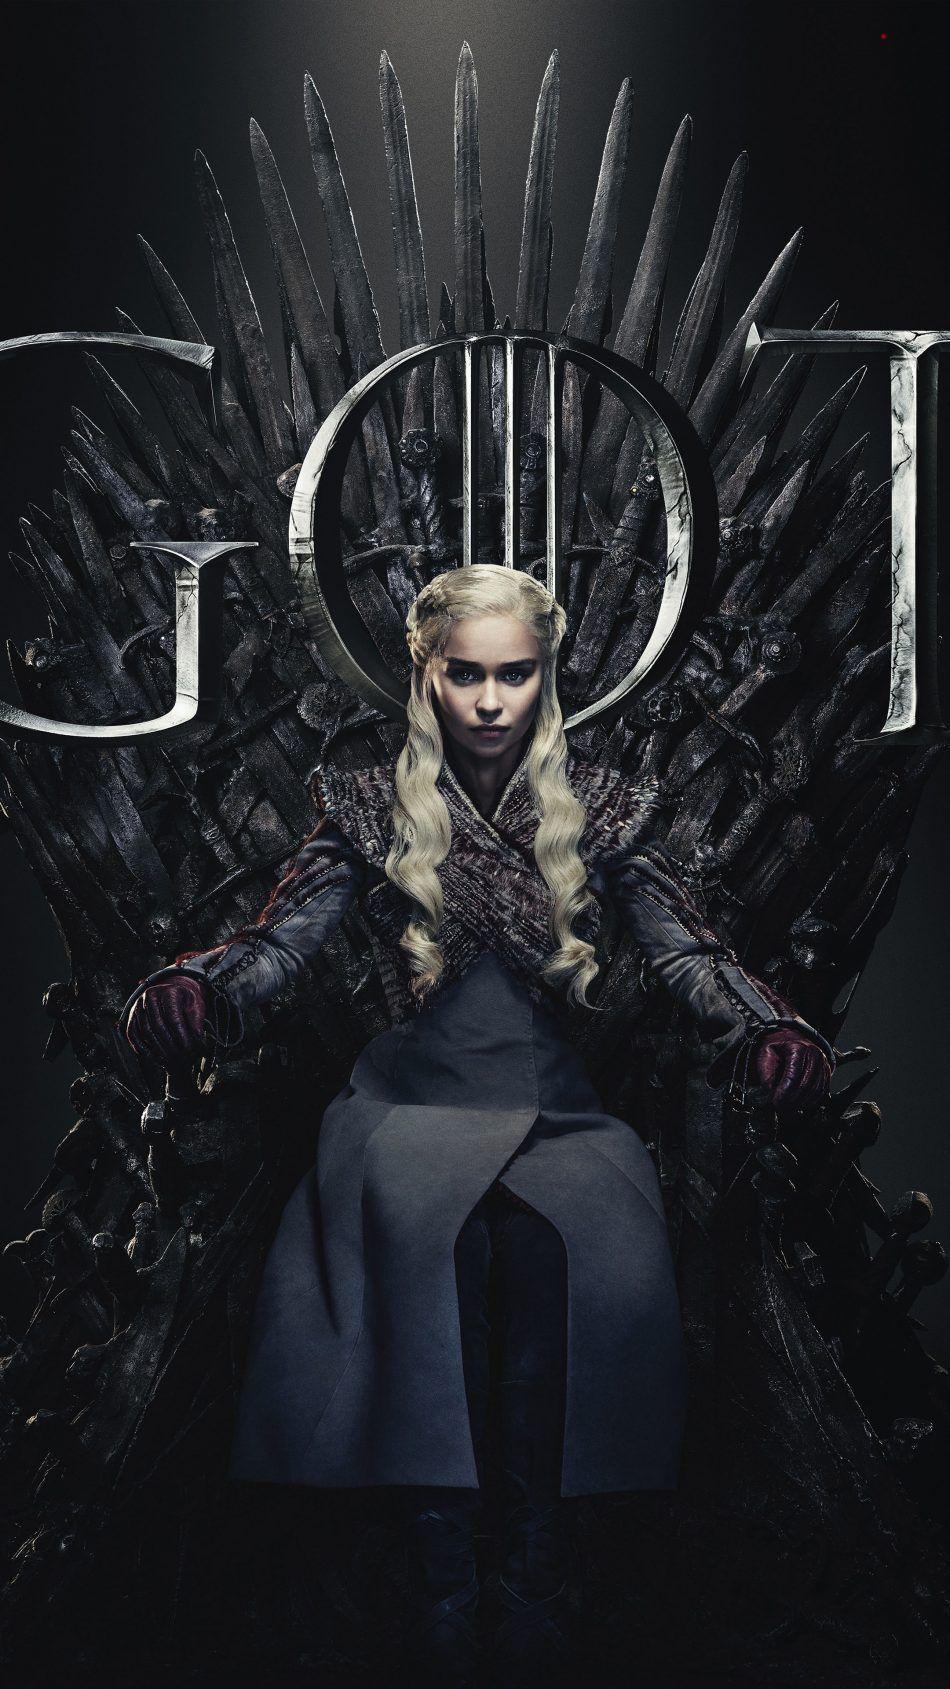 Daenerys Targaryen Game Of Thrones Season 8 4k Ultra Hd Mobile Wallpaper Gameofthroneshumor Iron Throne Game Got Memes Game Of Thrones Facts